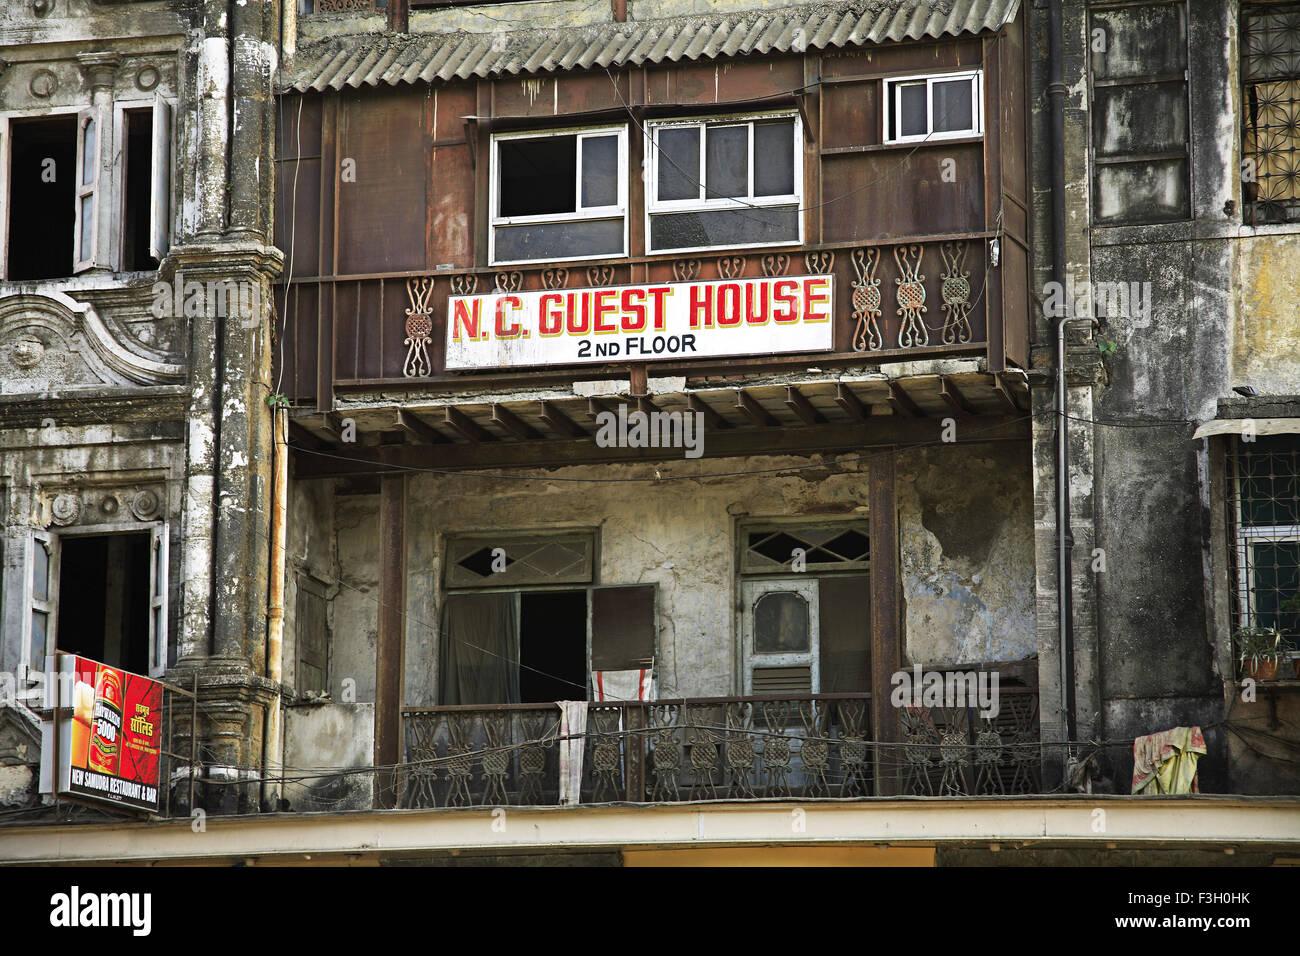 N. C. guest house ; J. Boman Behram road ; Bombay now Mumbai ; Maharashtra ; India - Stock Image